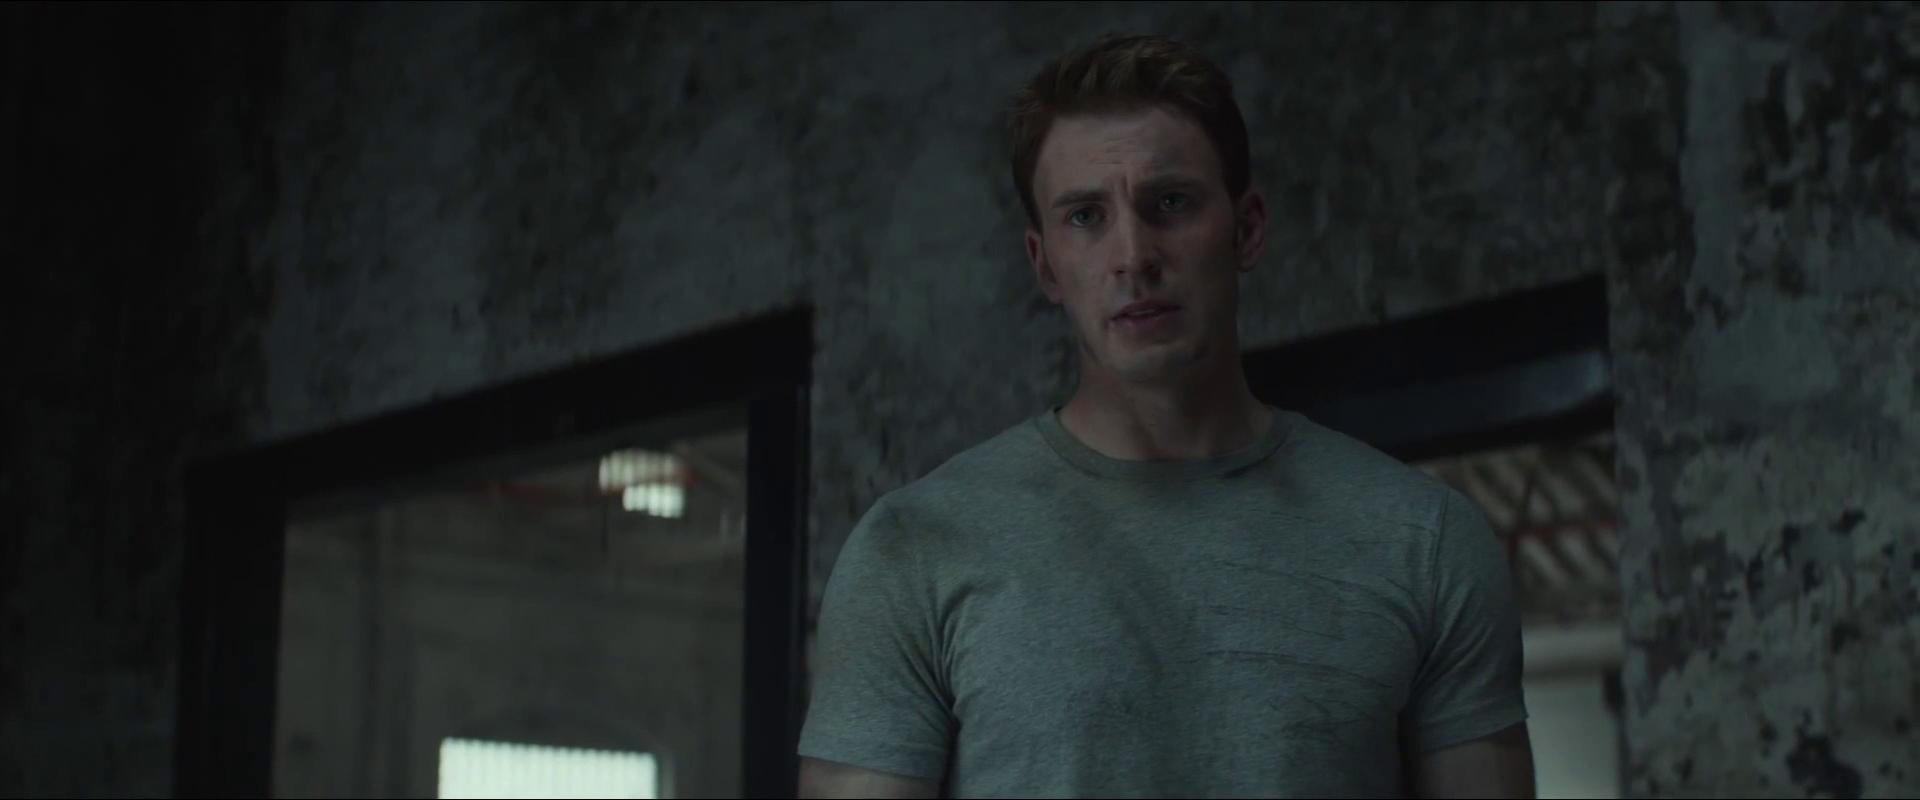 Captain America : Civil War - Page 2 991902CaptainAmericaCivilWarTrailerWorldpremiereScreens02